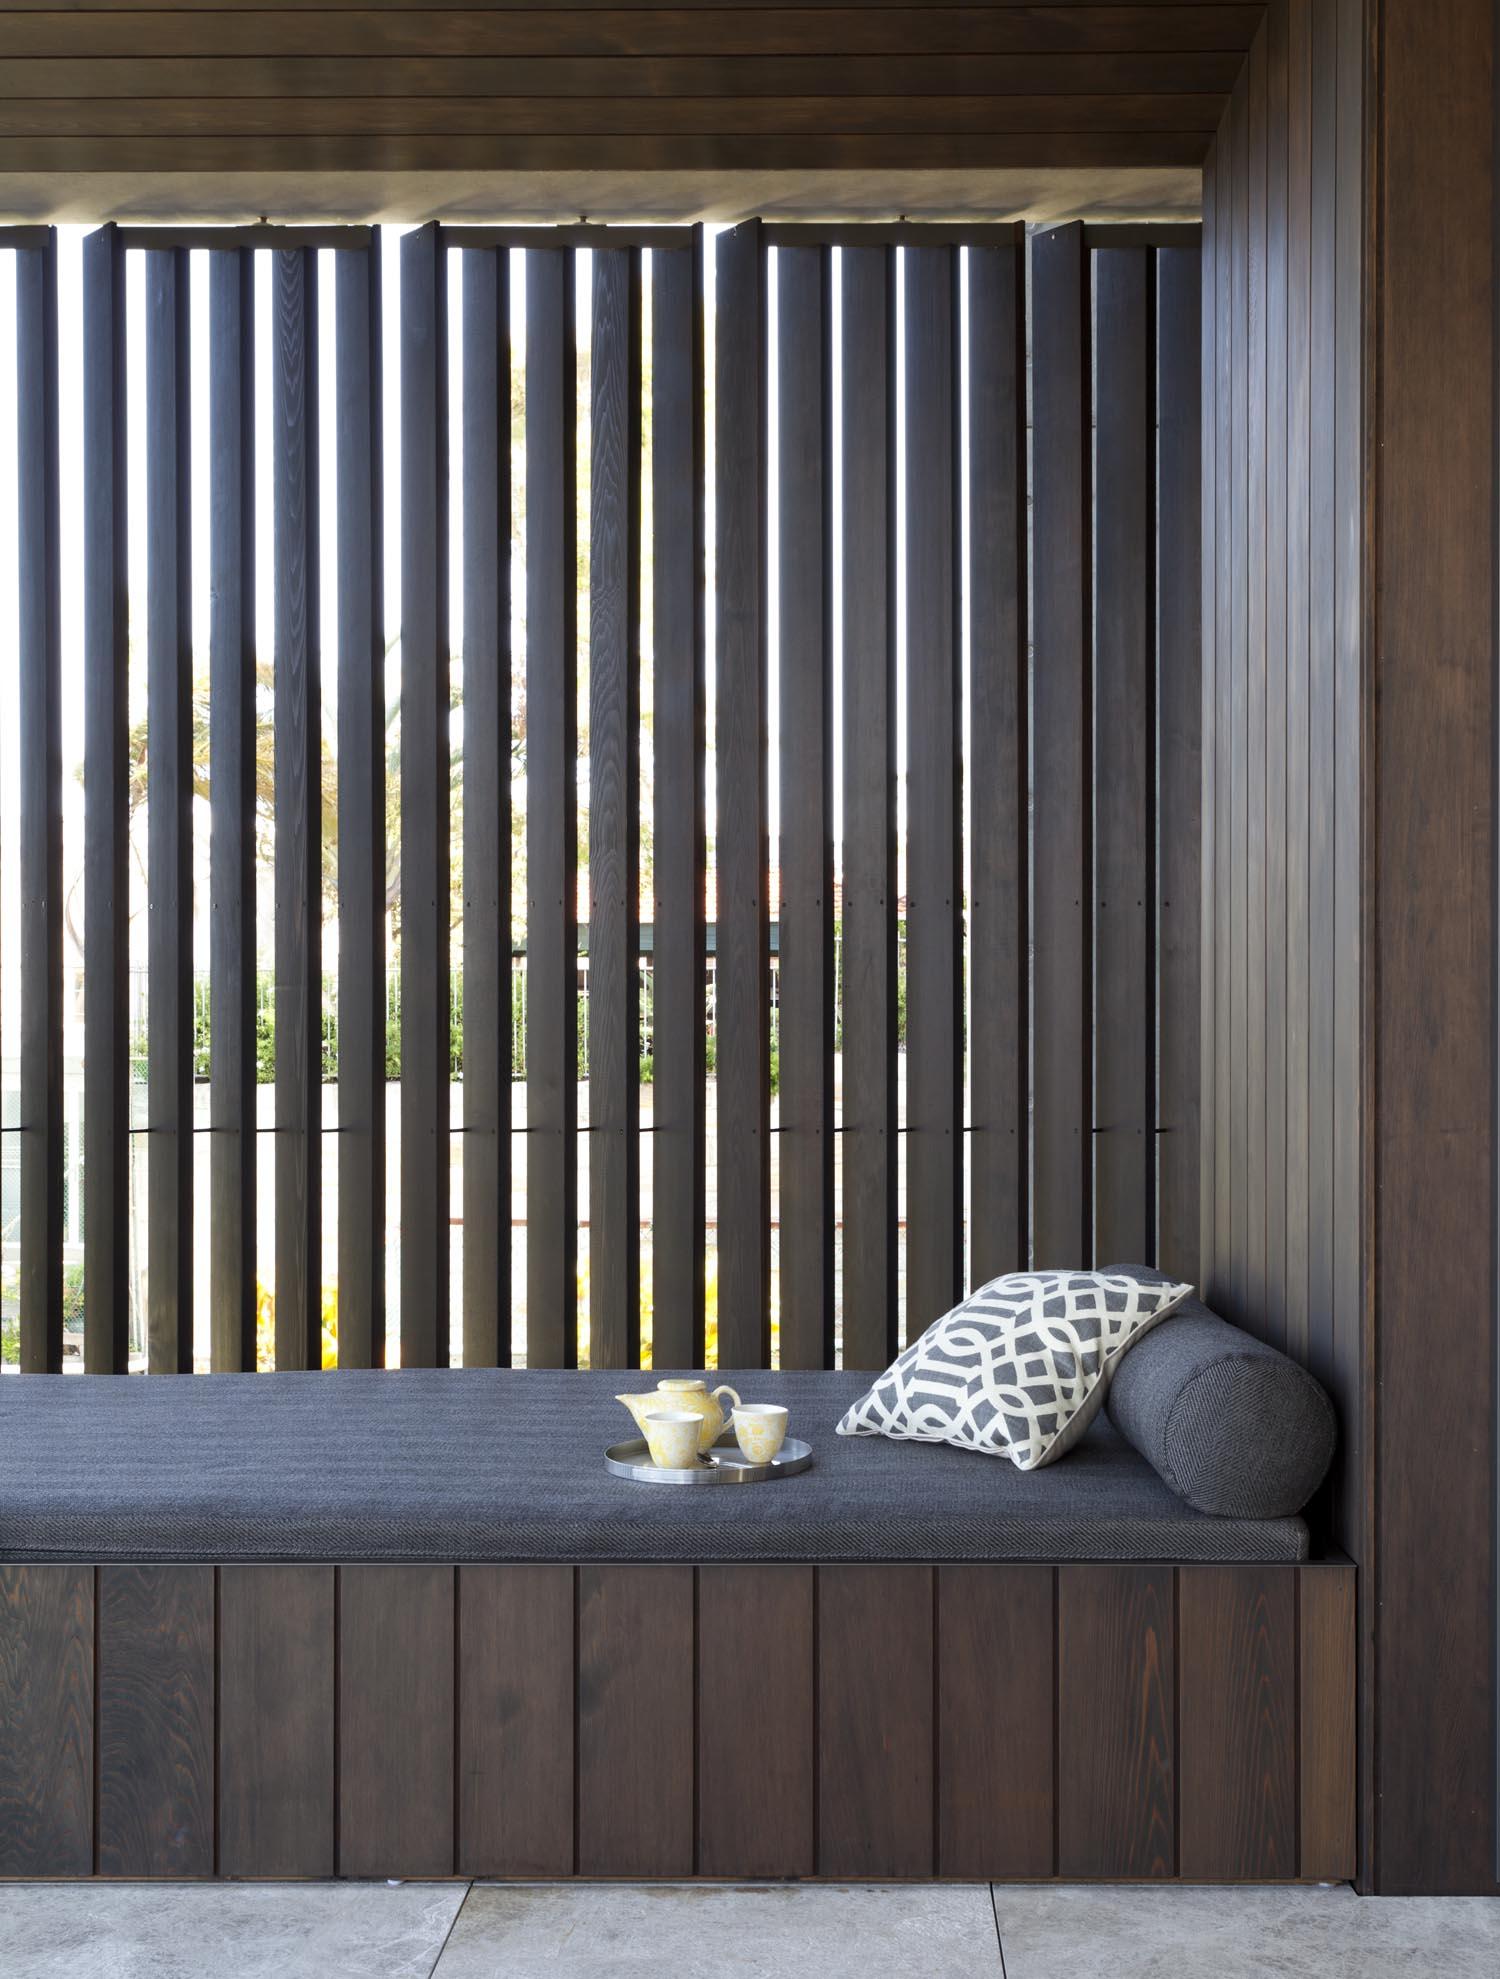 Gordon's Bay House - Australian Sun Lounge - Madeleine Blanchfield Architects - Architecture Archive